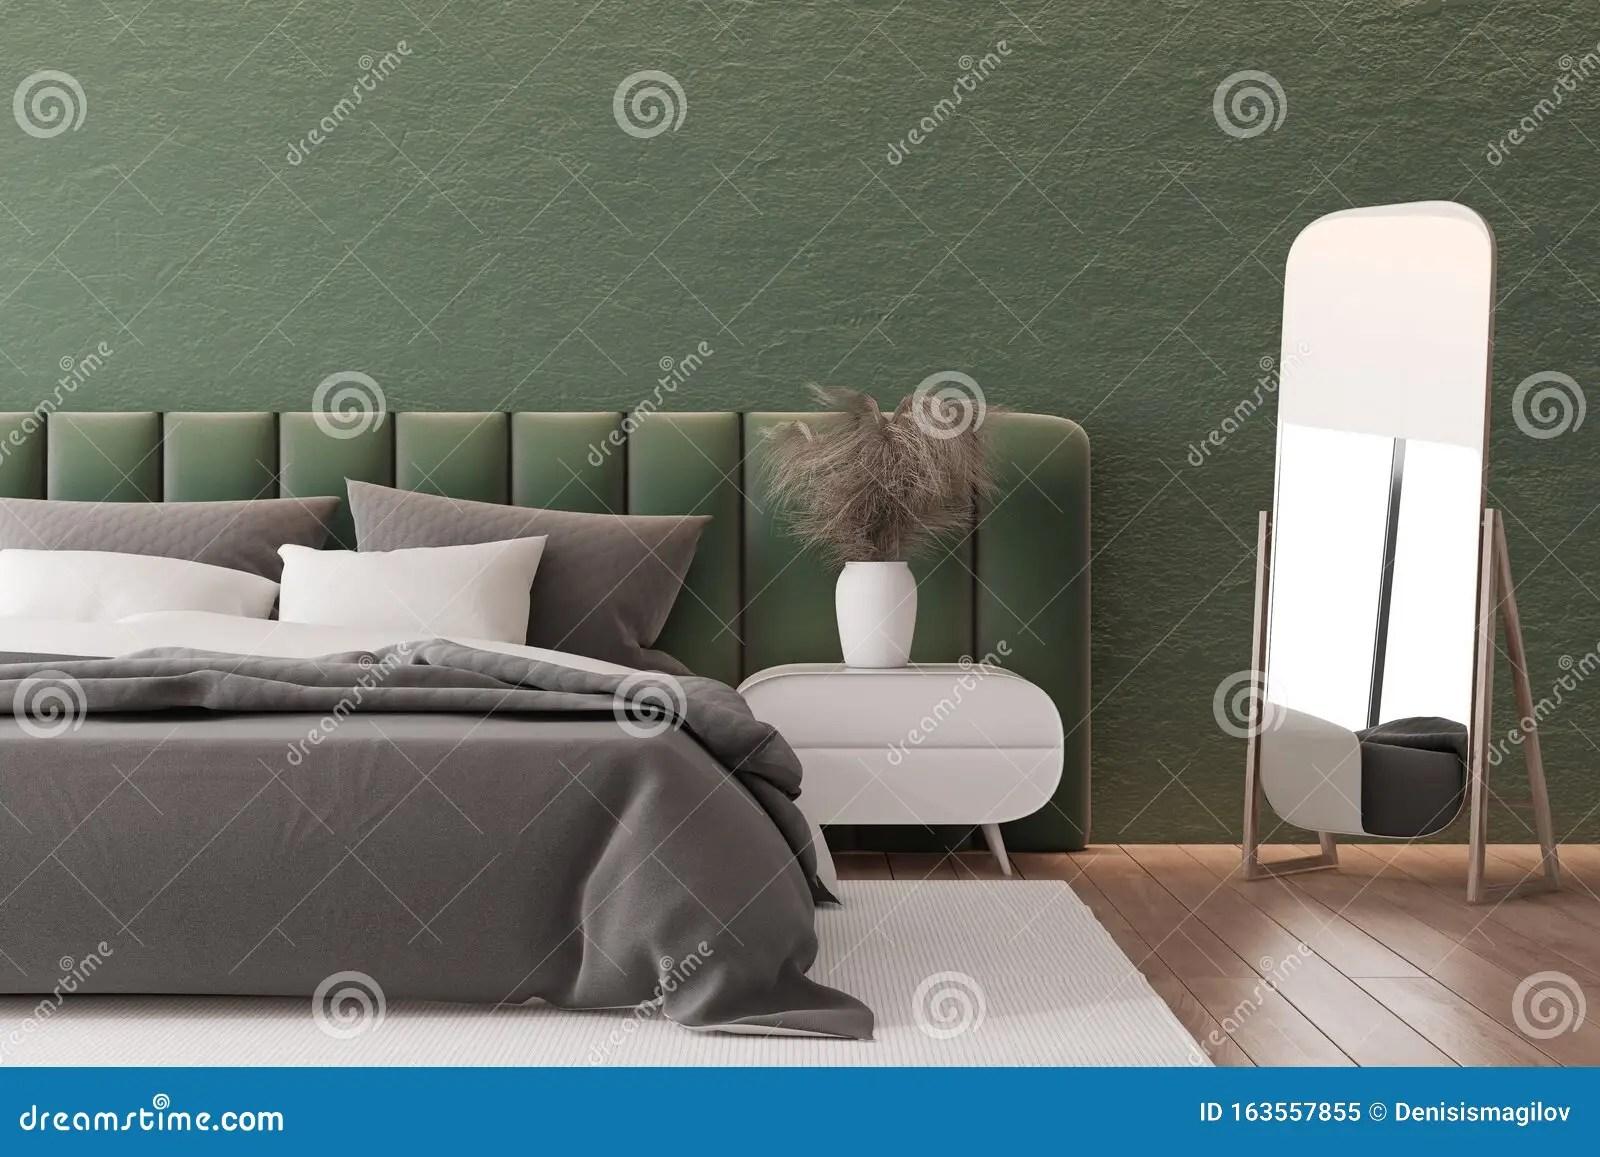 Dark Green Bedroom Interior With Mirror Stock Illustration Illustration Of Bedside Luxury 163557855